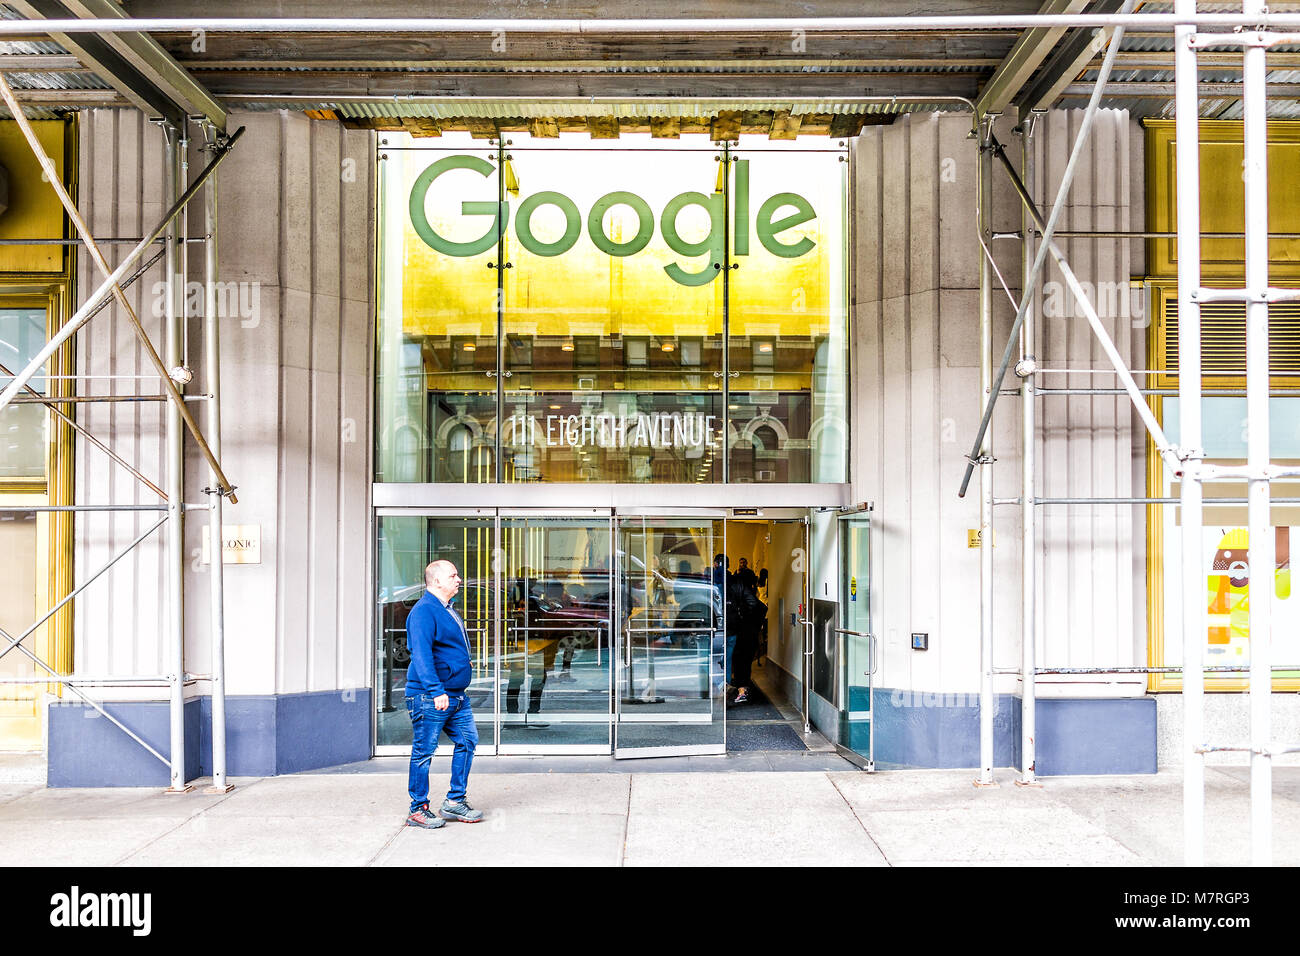 google company office. New York City, USA - October 30, 2017: Google Company Office Green Sign In Downtown Lower Chelsea Neighborhood District Manhattan NYC, People Entering